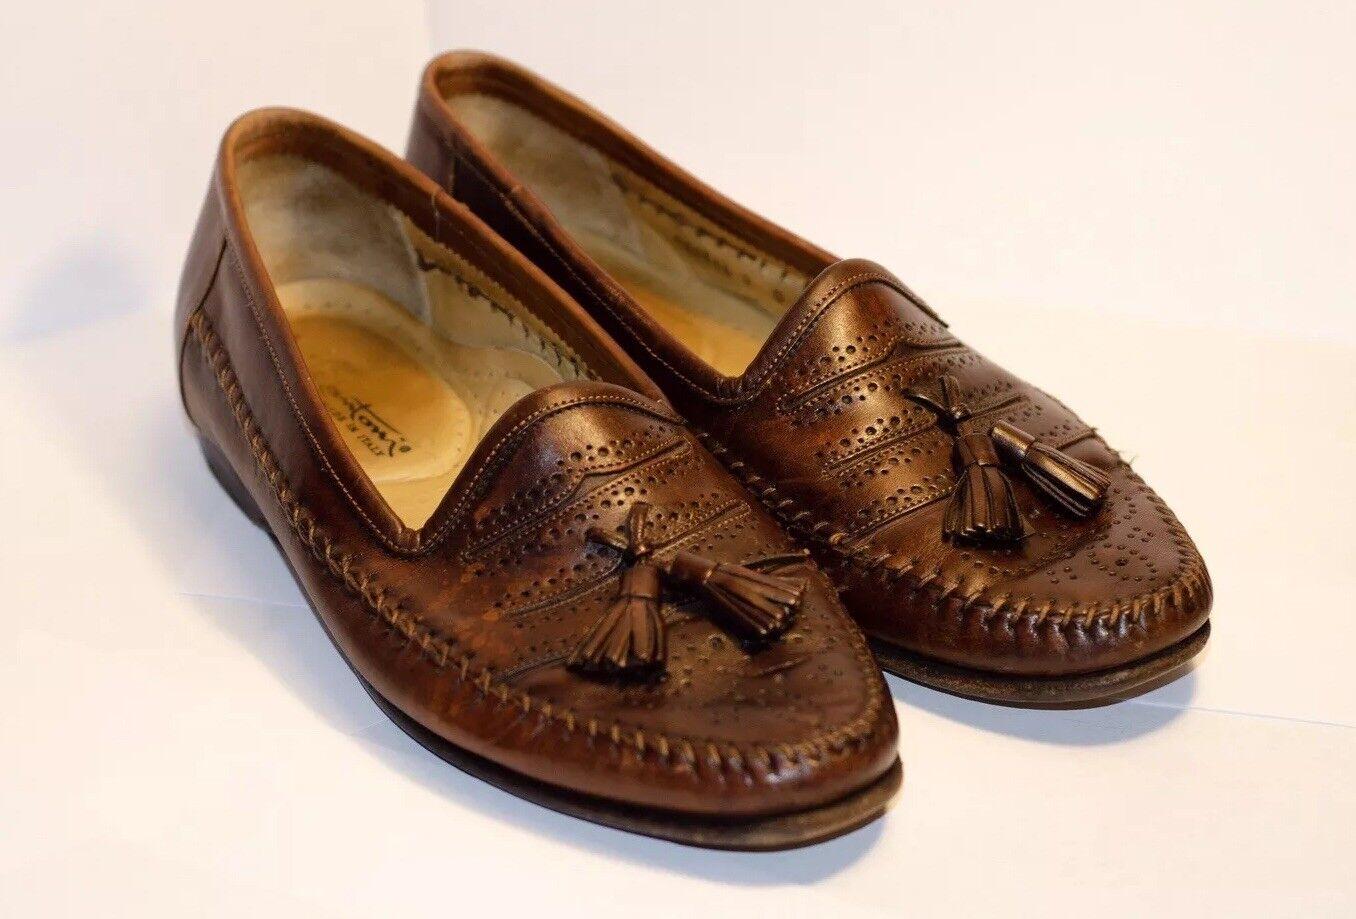 Men's Tassel Santoni Brown Leather Hand-crafted Tassel Men's Slip-on Loafer's 7D bb2f6b